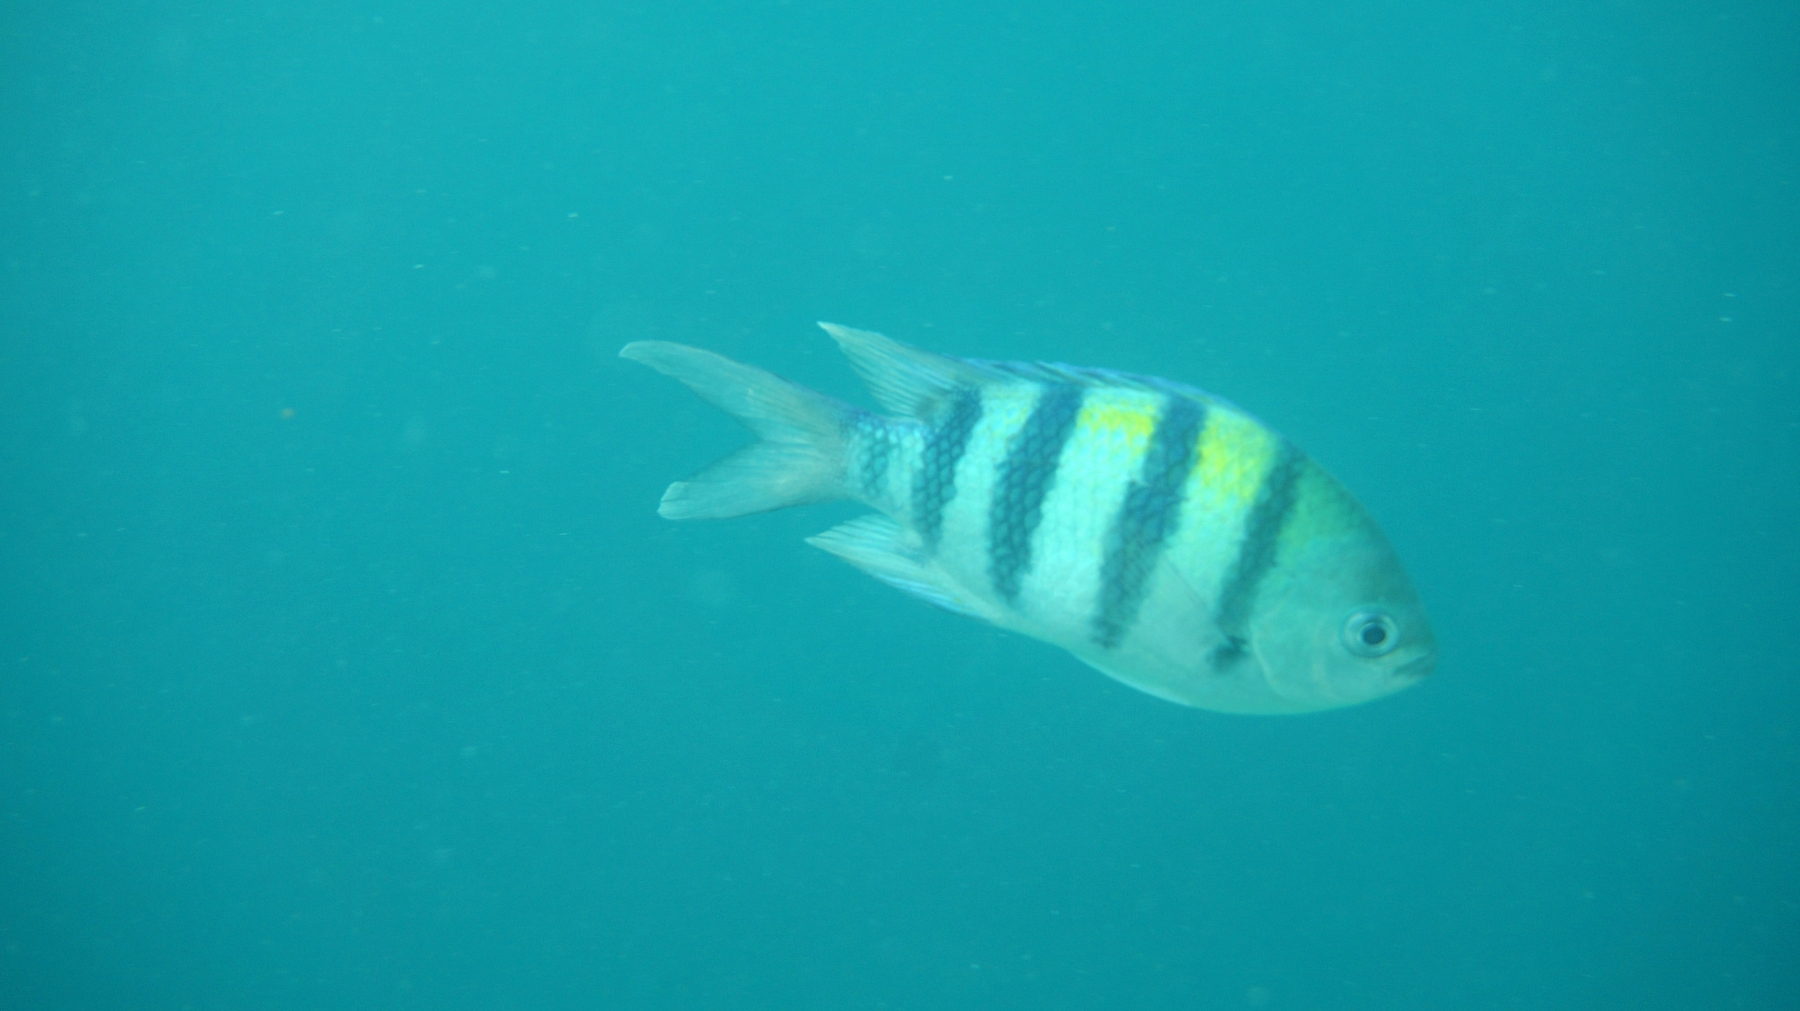 Abudefduf_vaigiensis_005_C_Damiselas-Peces-Payaso_L_Maldivas_U_Sebas_01072015